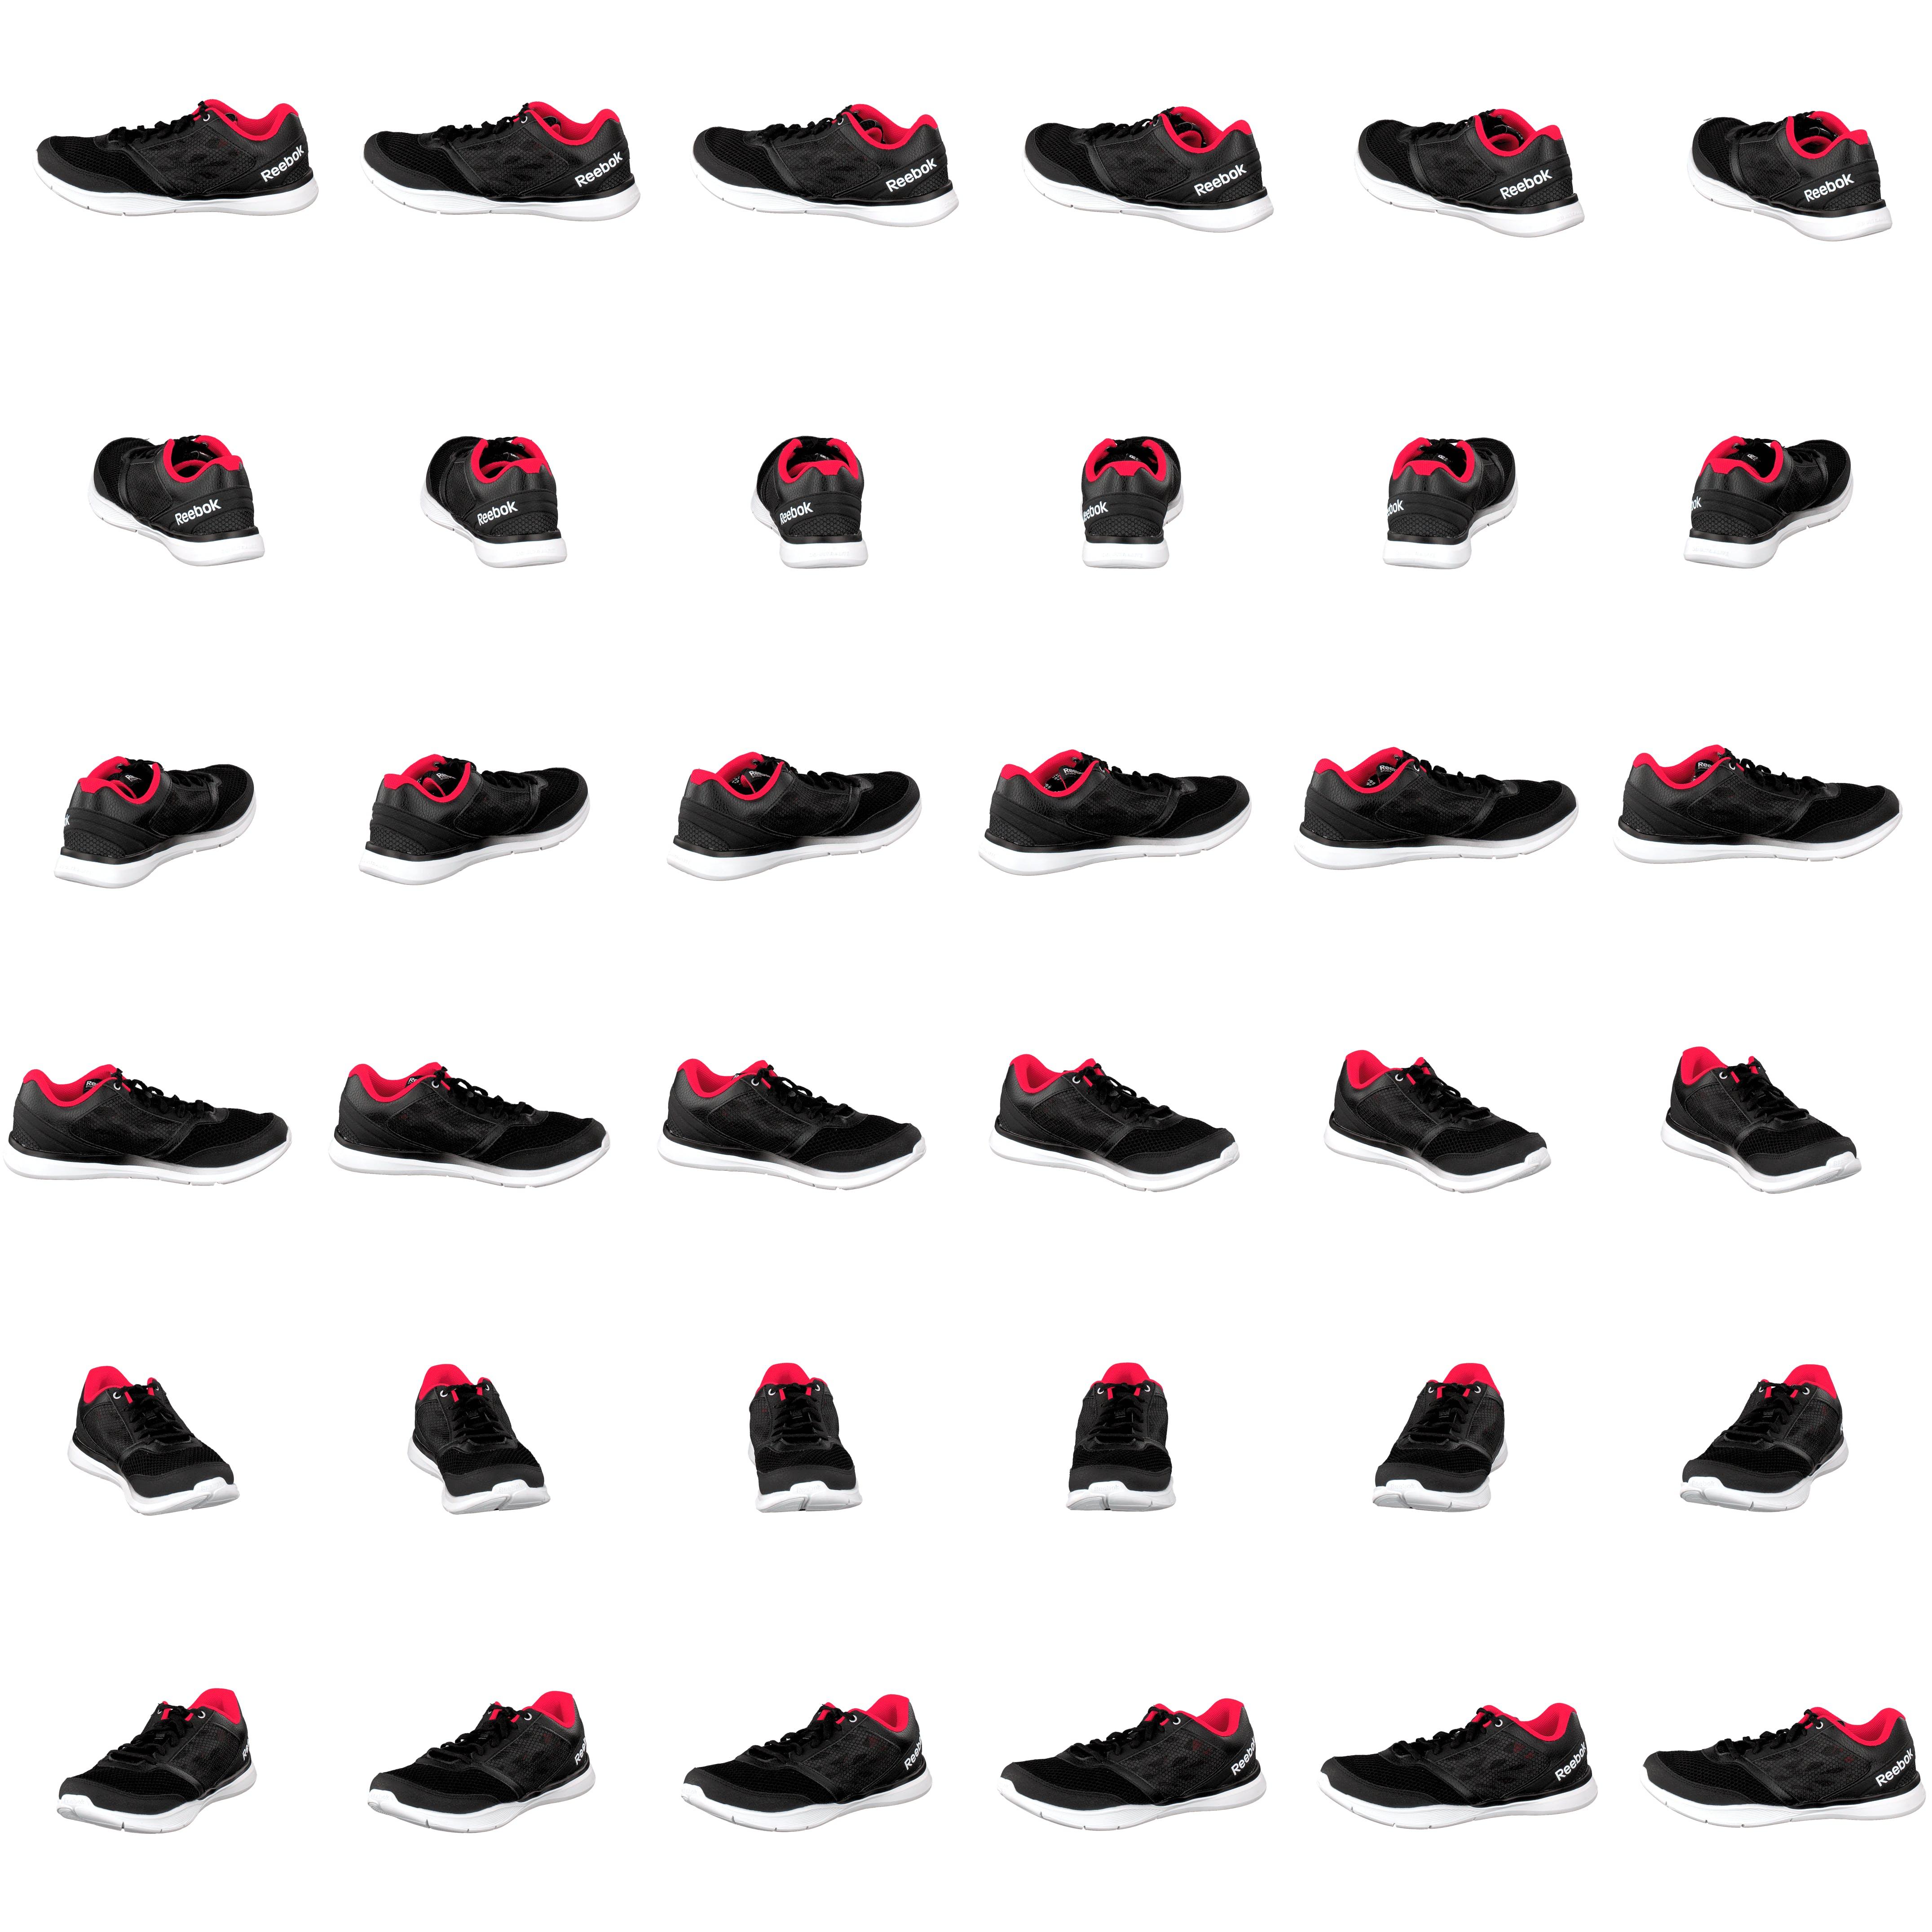 Acheter Reebok Cardio Workout Low Rs BlackGreyNeon Cherry